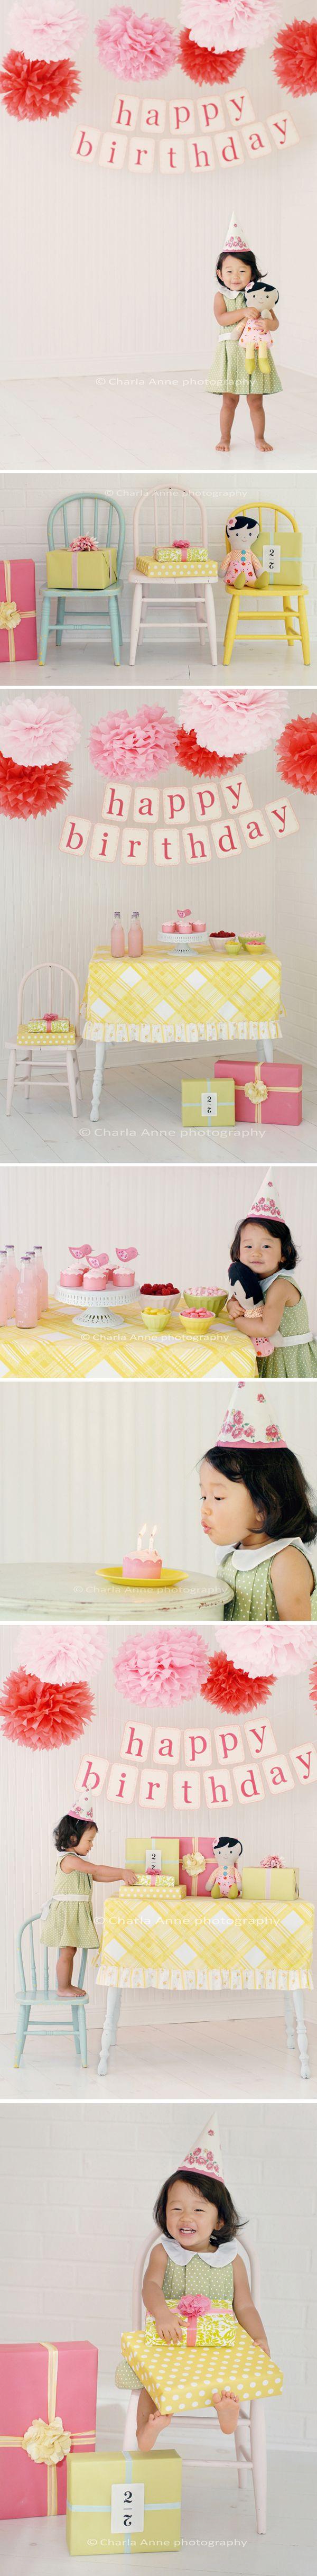 .: Baby Girl Birthday, 2Nd Birthday Girls Photography, Cutest Ideas, Parties Ideas Decor, Baby Girls Photo Shoots Props, Girls Birthday Parties, Baby Girls Birthday, Birthday Photos, Colors Chairs